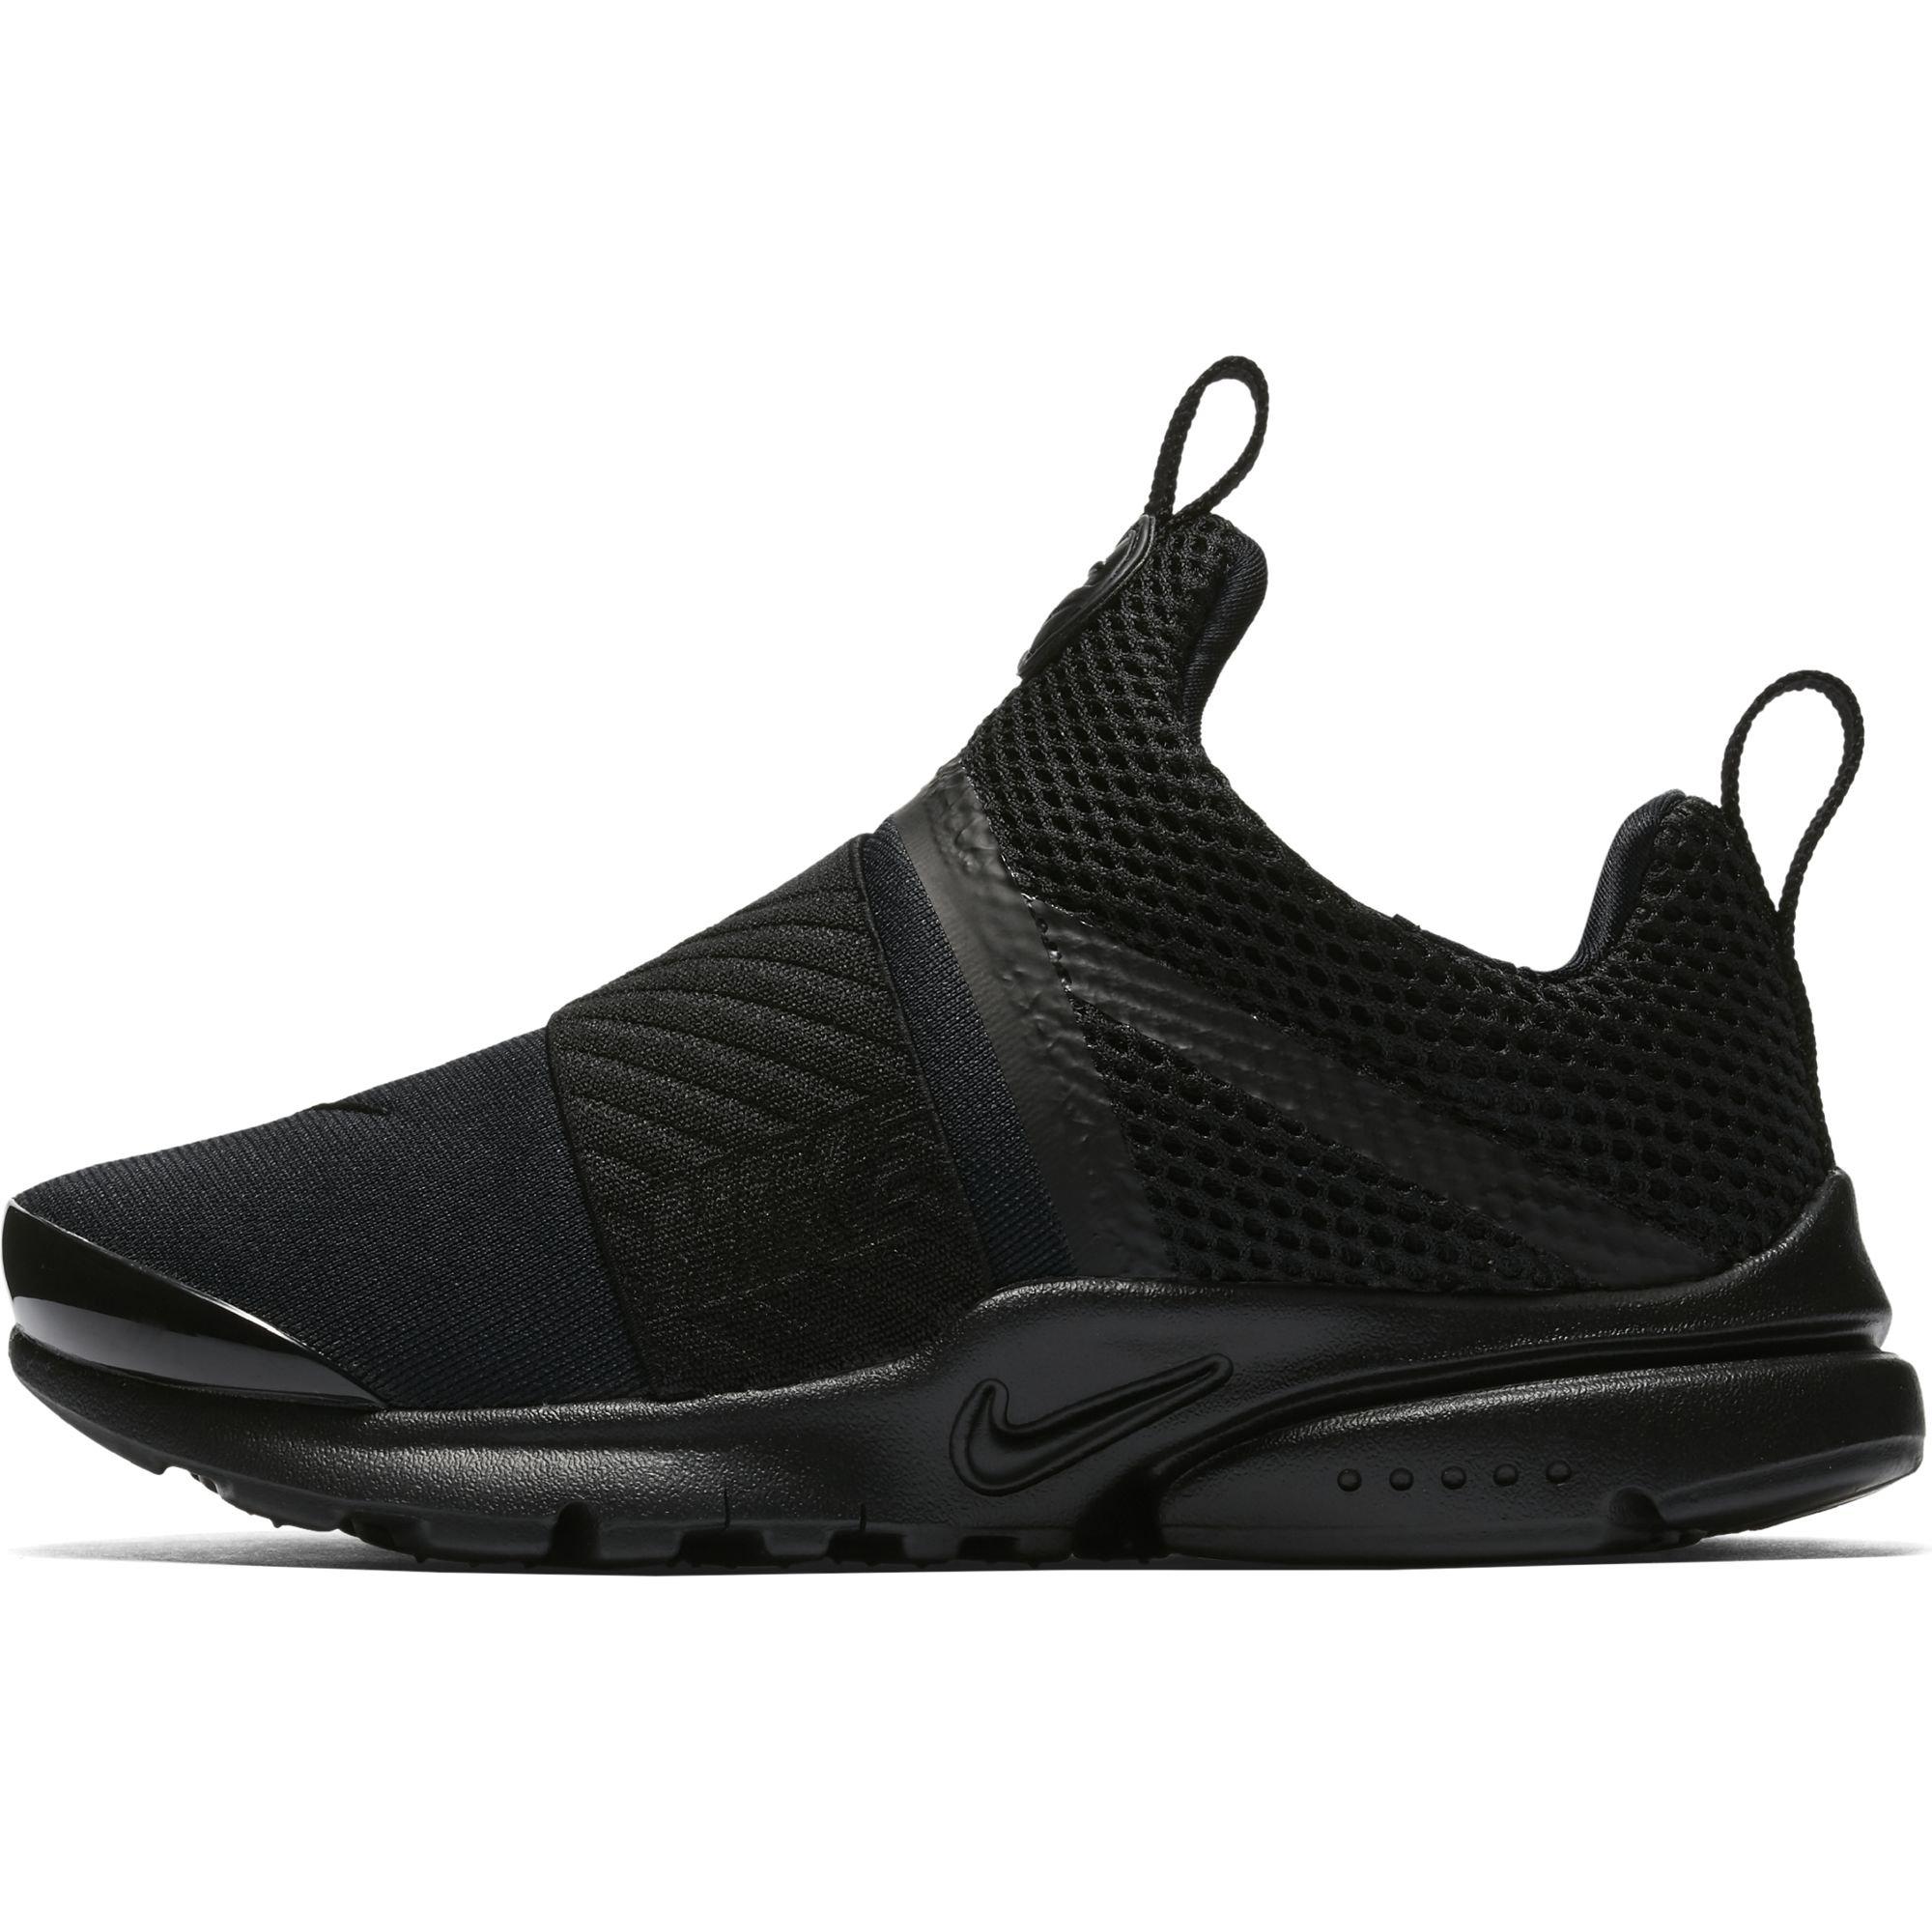 Nike Presto Extreme (PS) Little Kids Shoes Black/Black 870023-001 (1 M US)